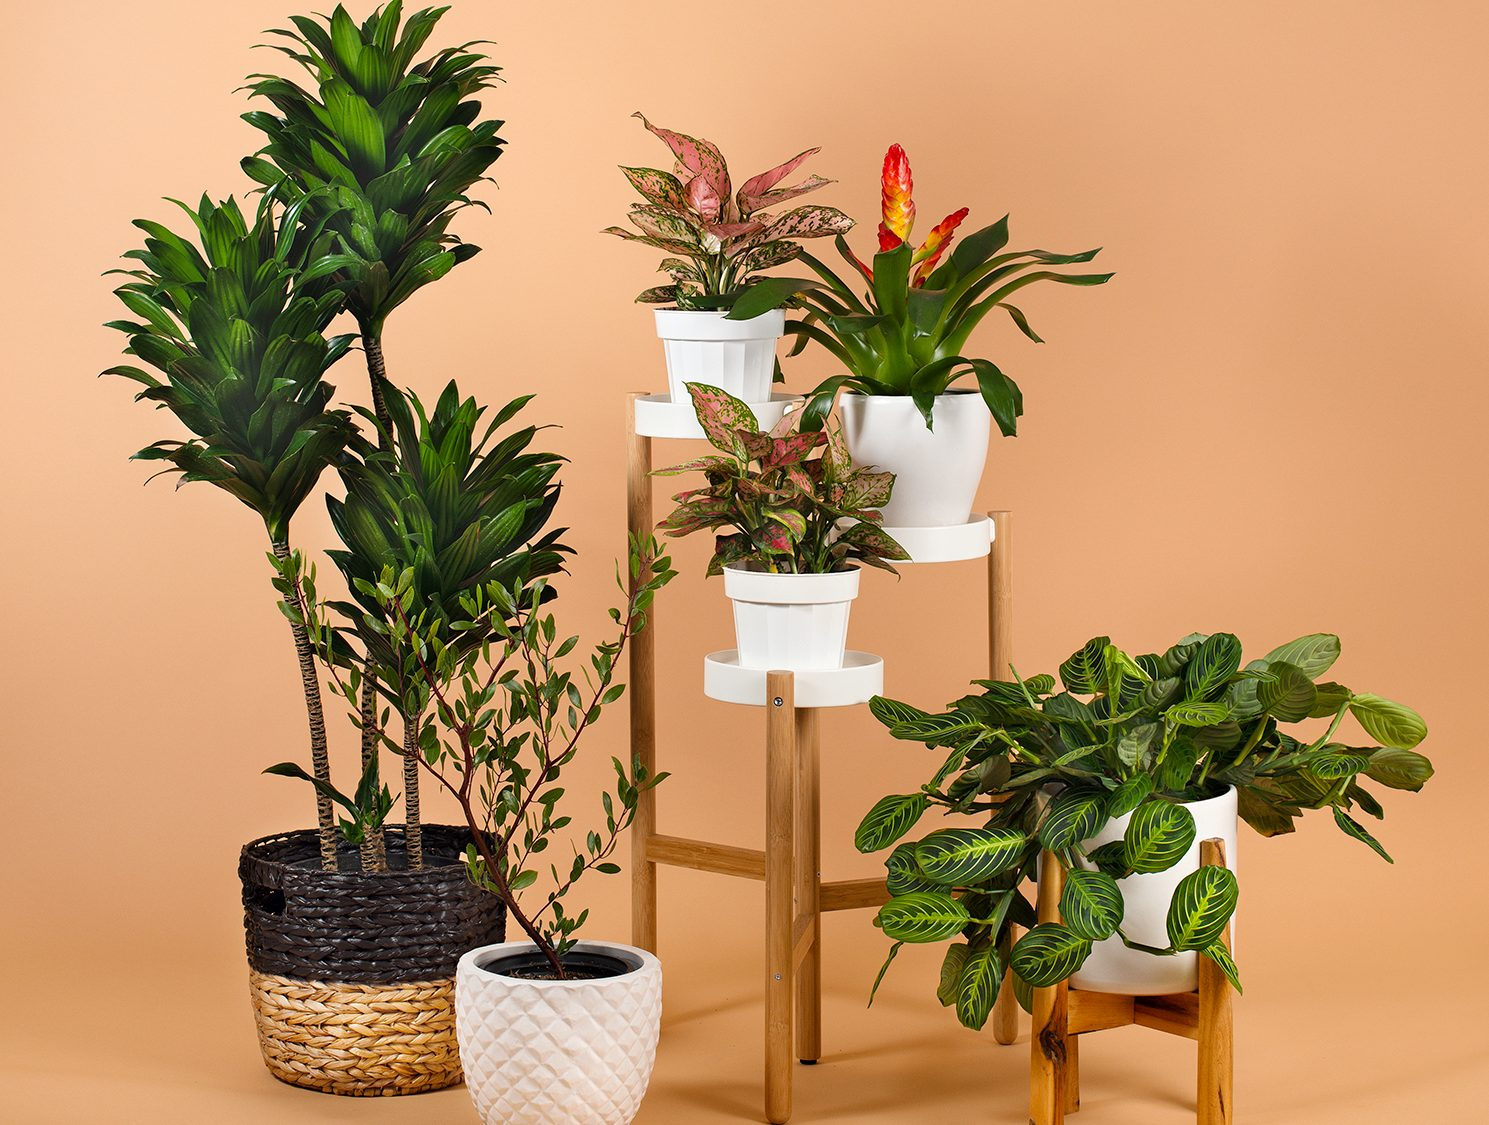 Unique Plants From Local Nurseries